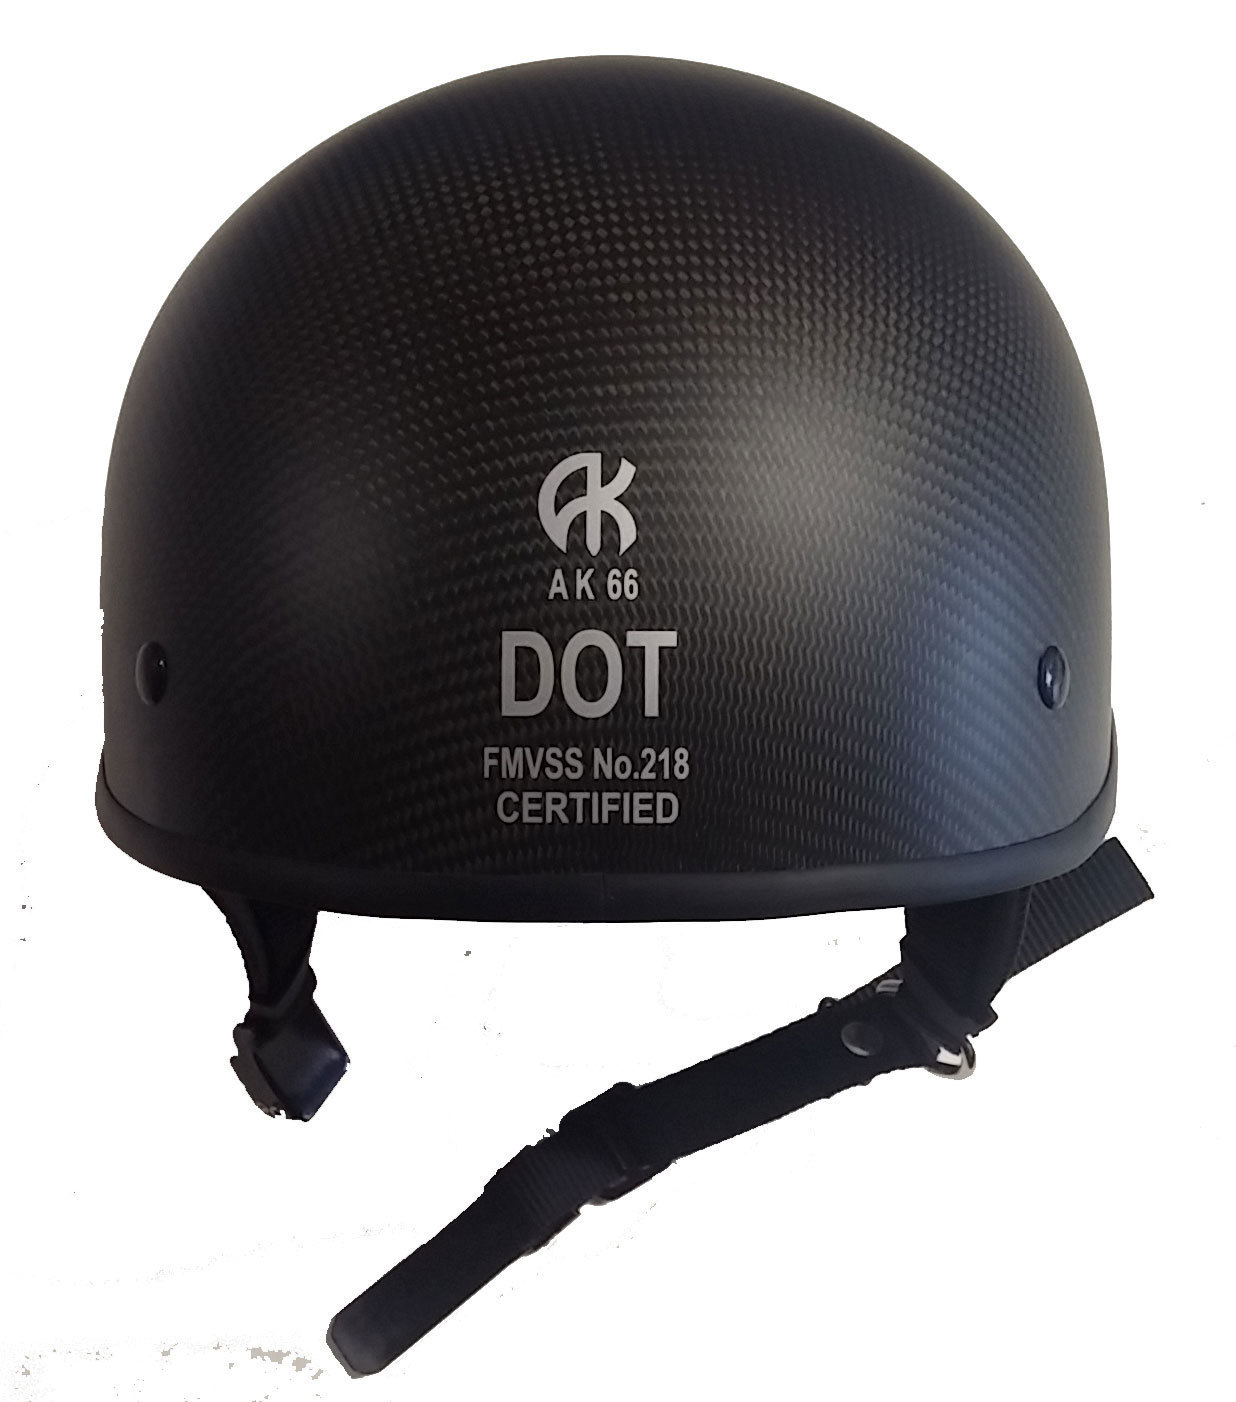 Smallest DOT Helmet - Carbon AK-66